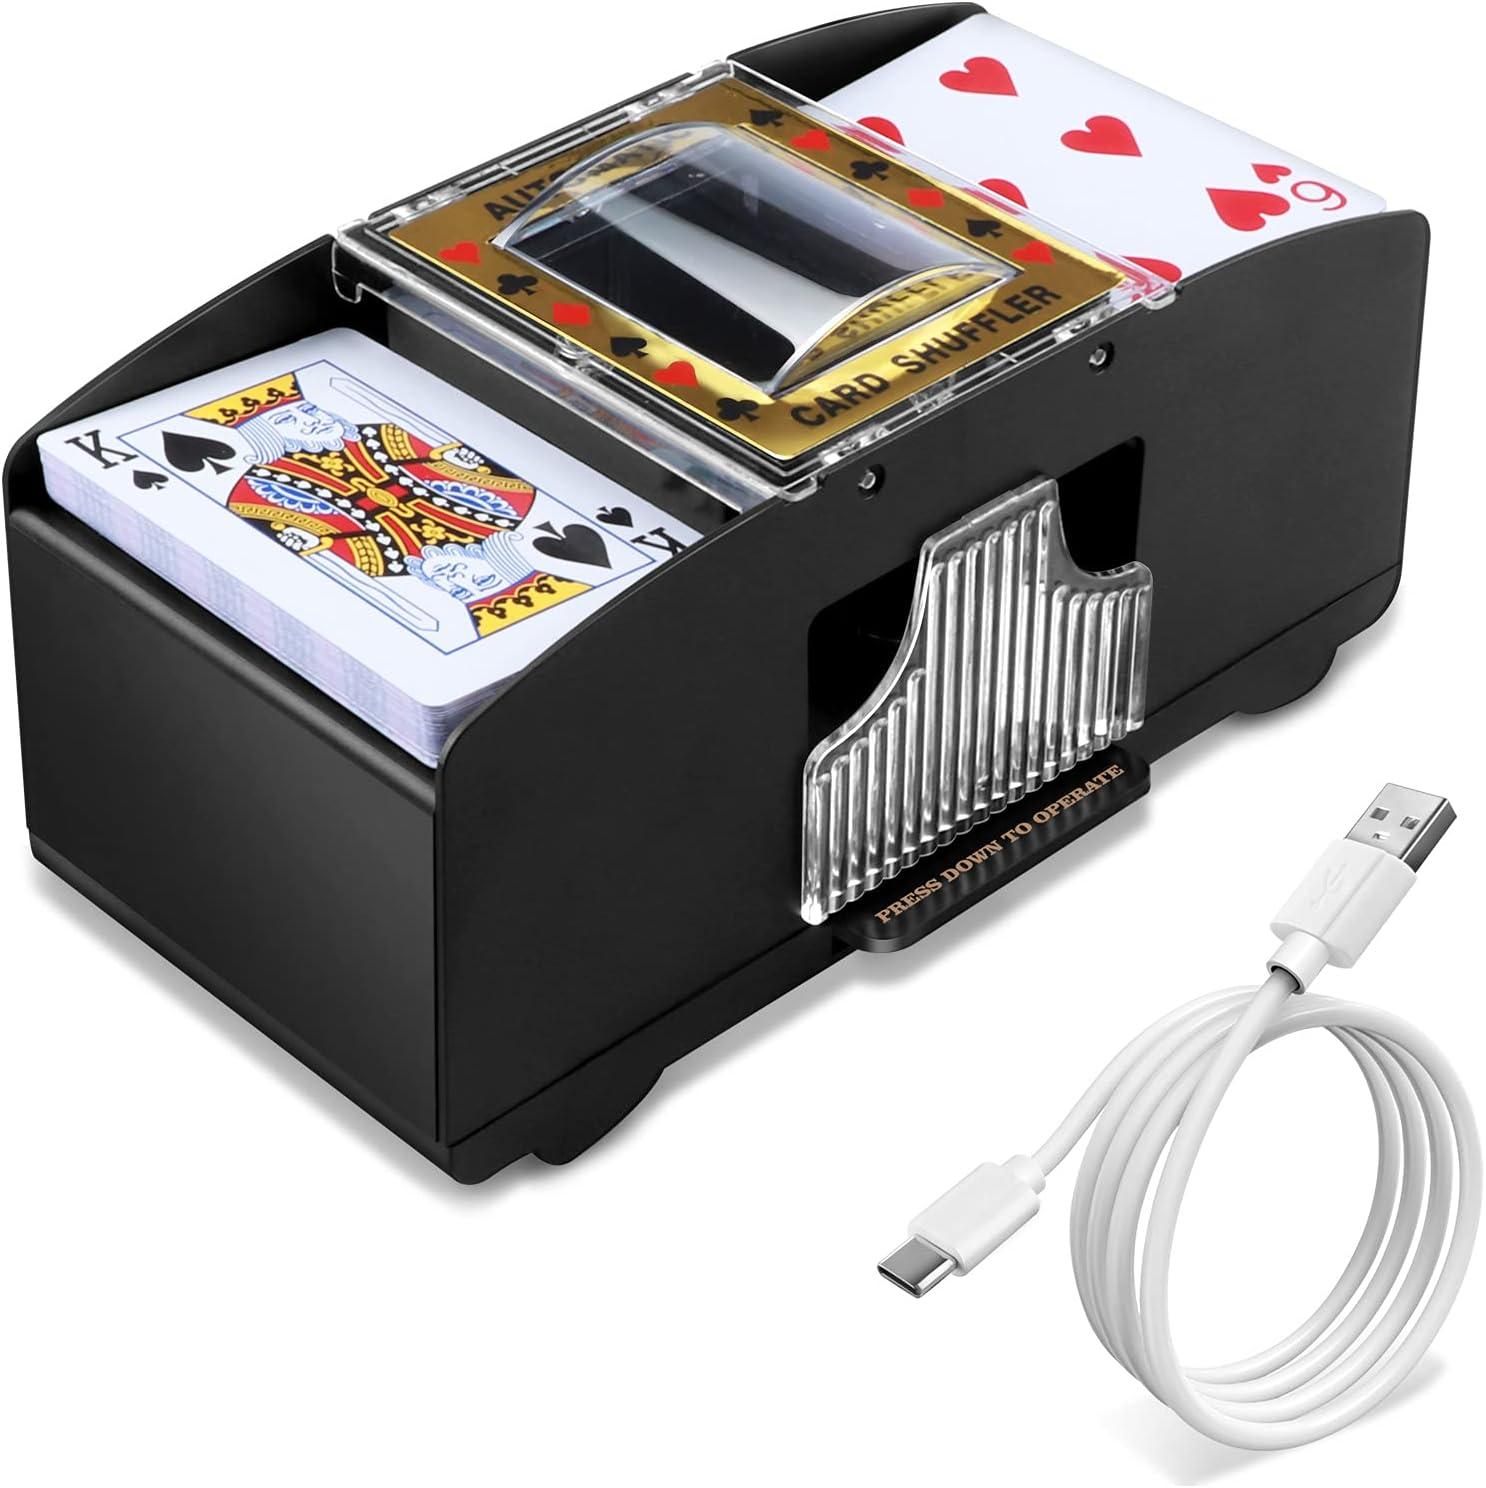 Automatic Card Columbus Mall Shuffler Electronic Shuffling Poker Austin Mall Casino